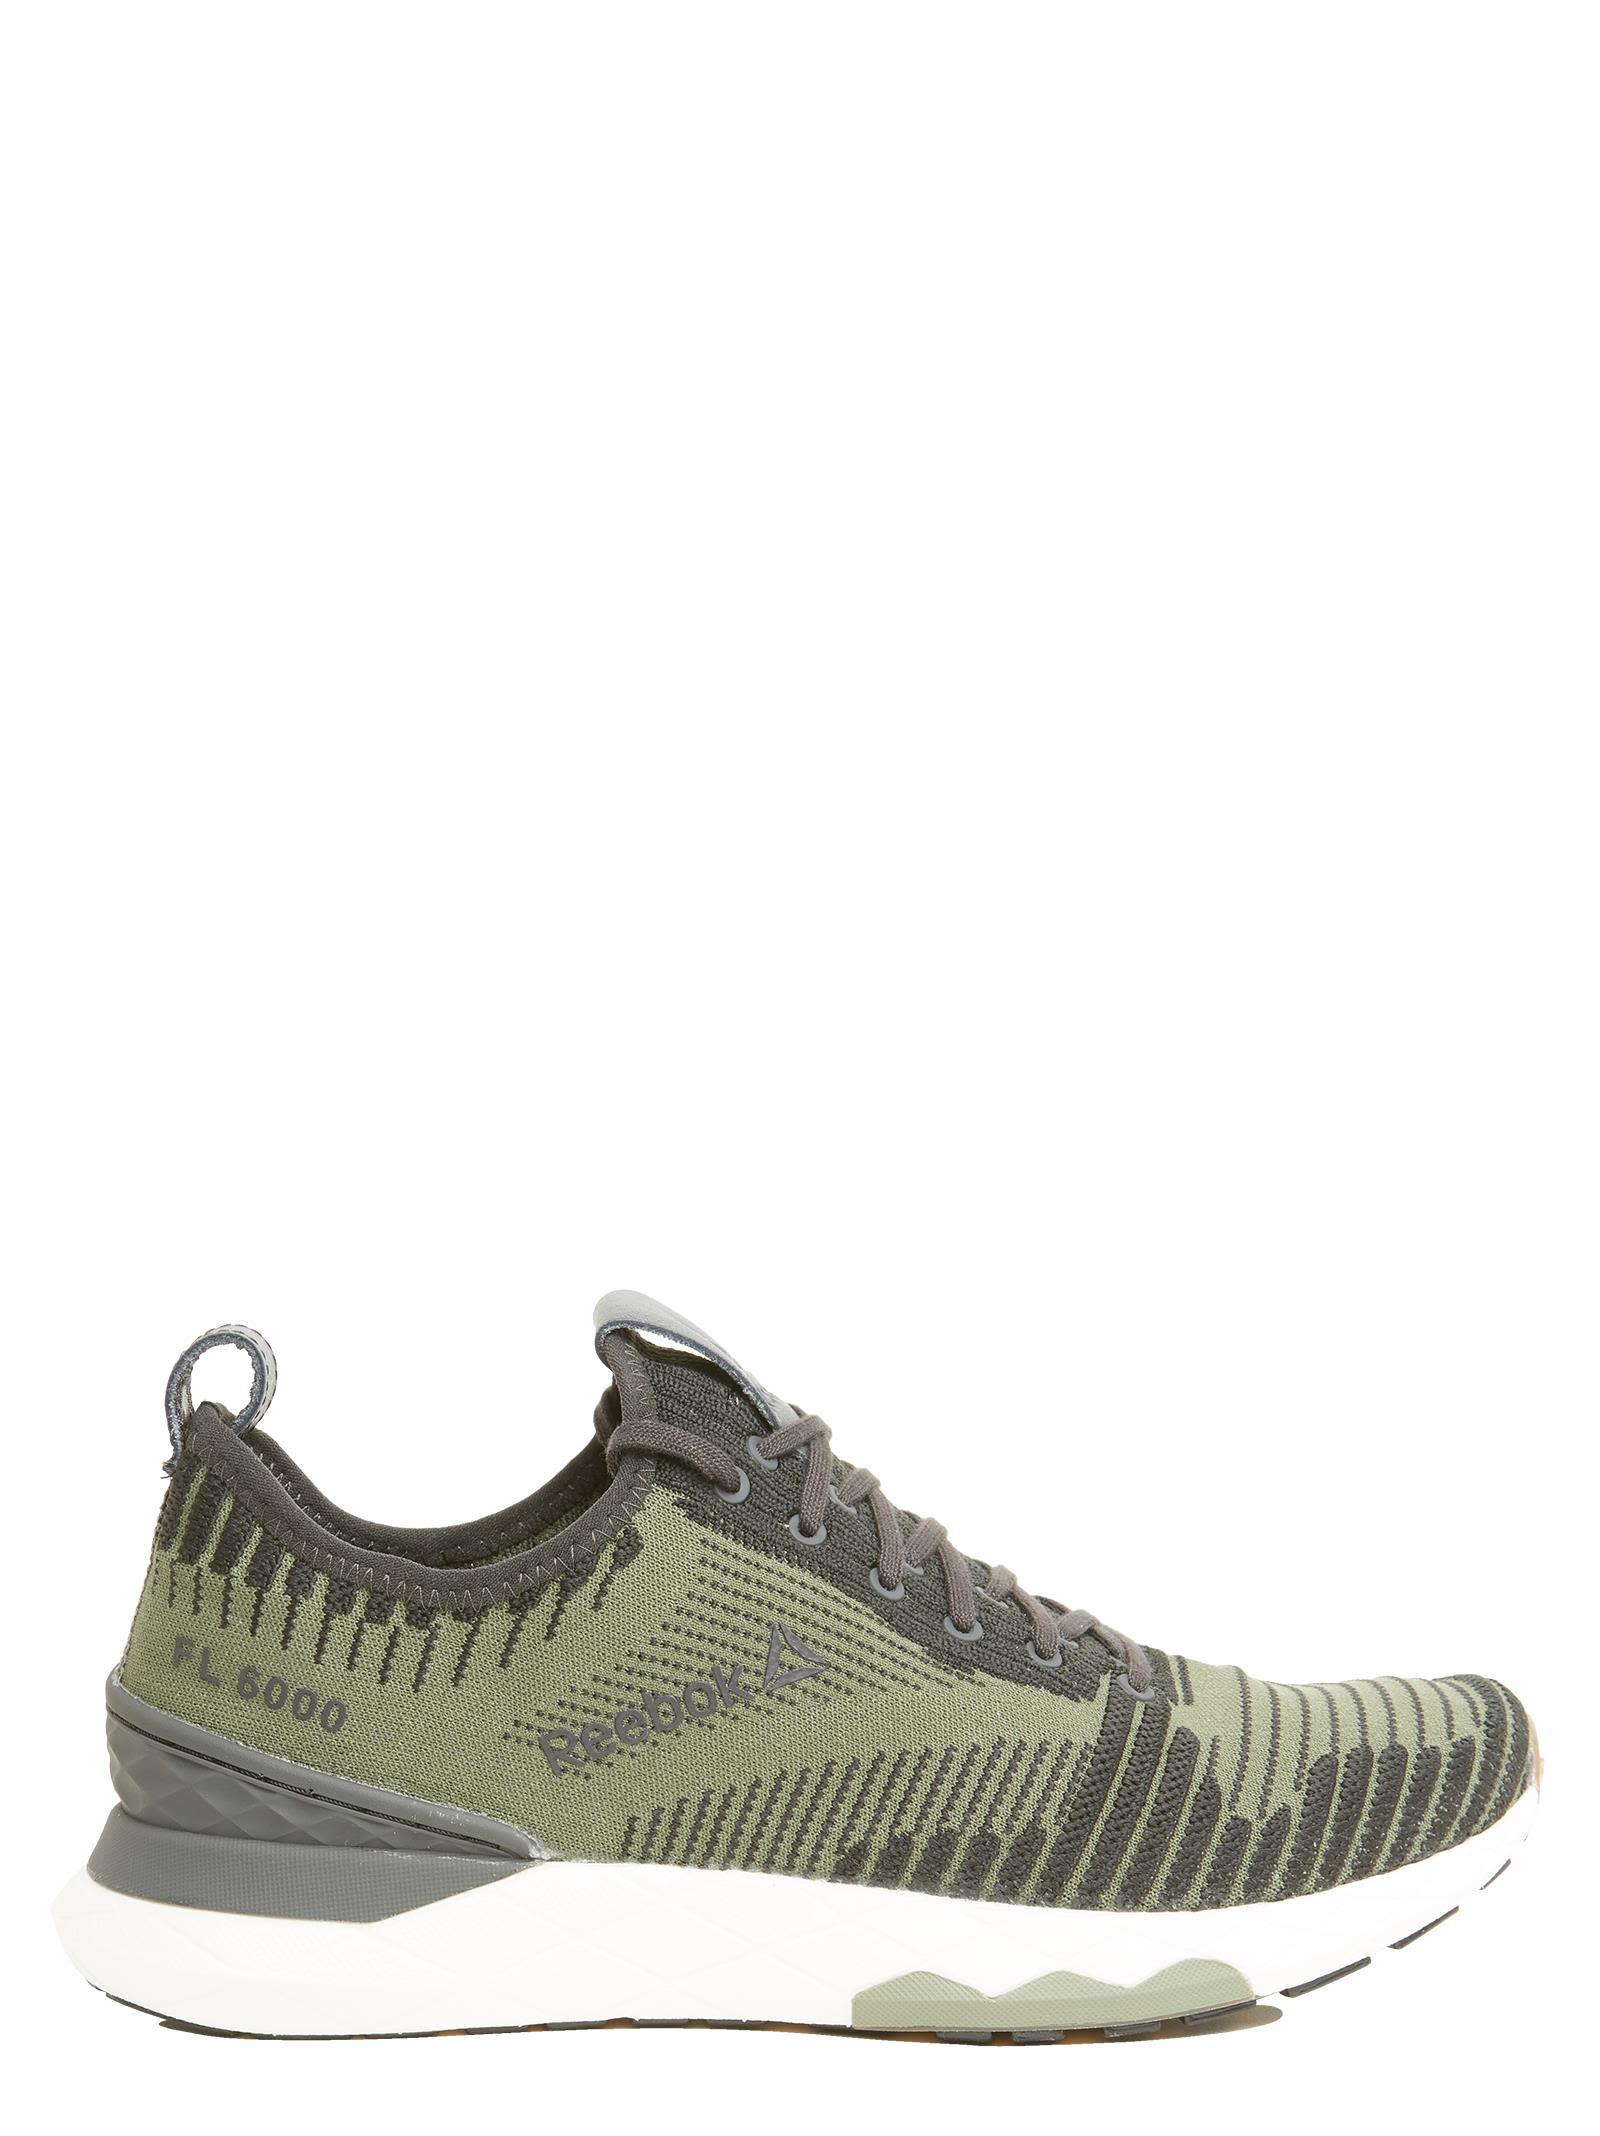 Reebok 'floatride Rs Run' Shoes